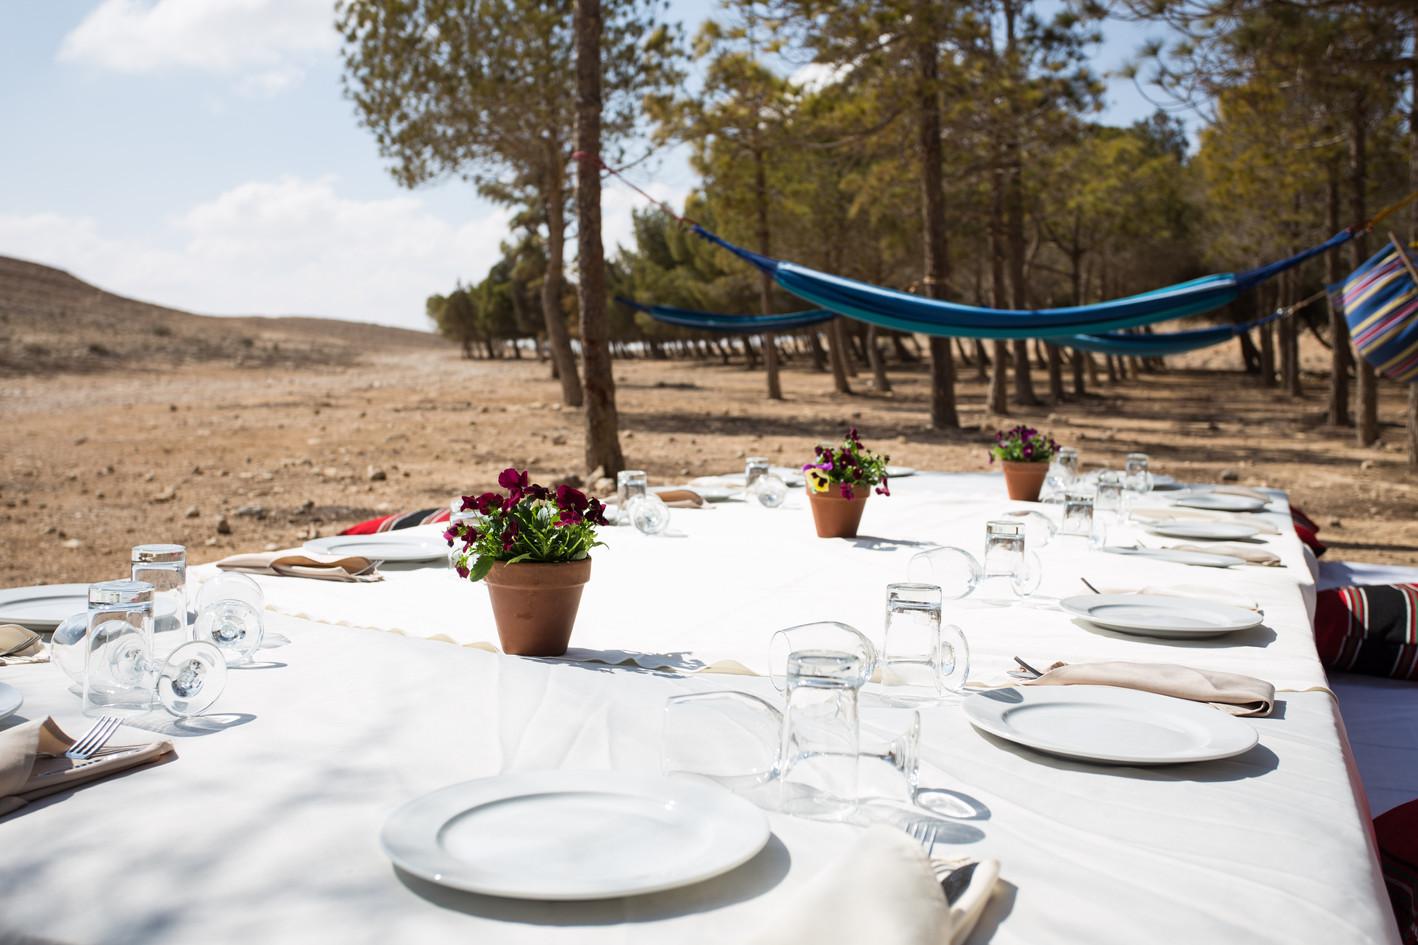 Unique lunch in Mitzpe Ramon